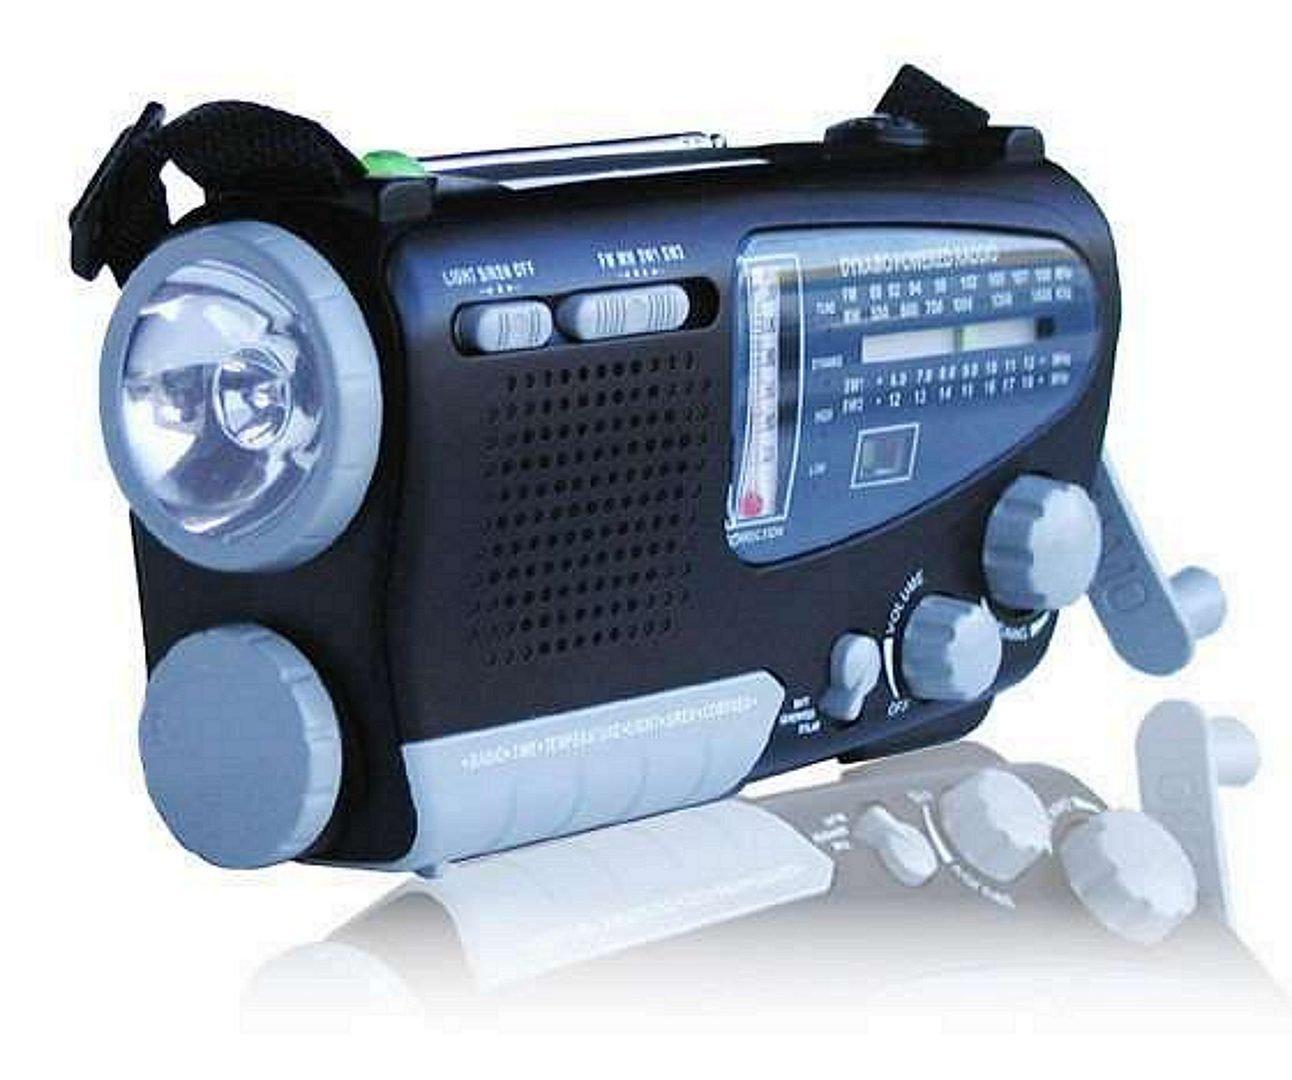 Emergency Radio with Flashlight